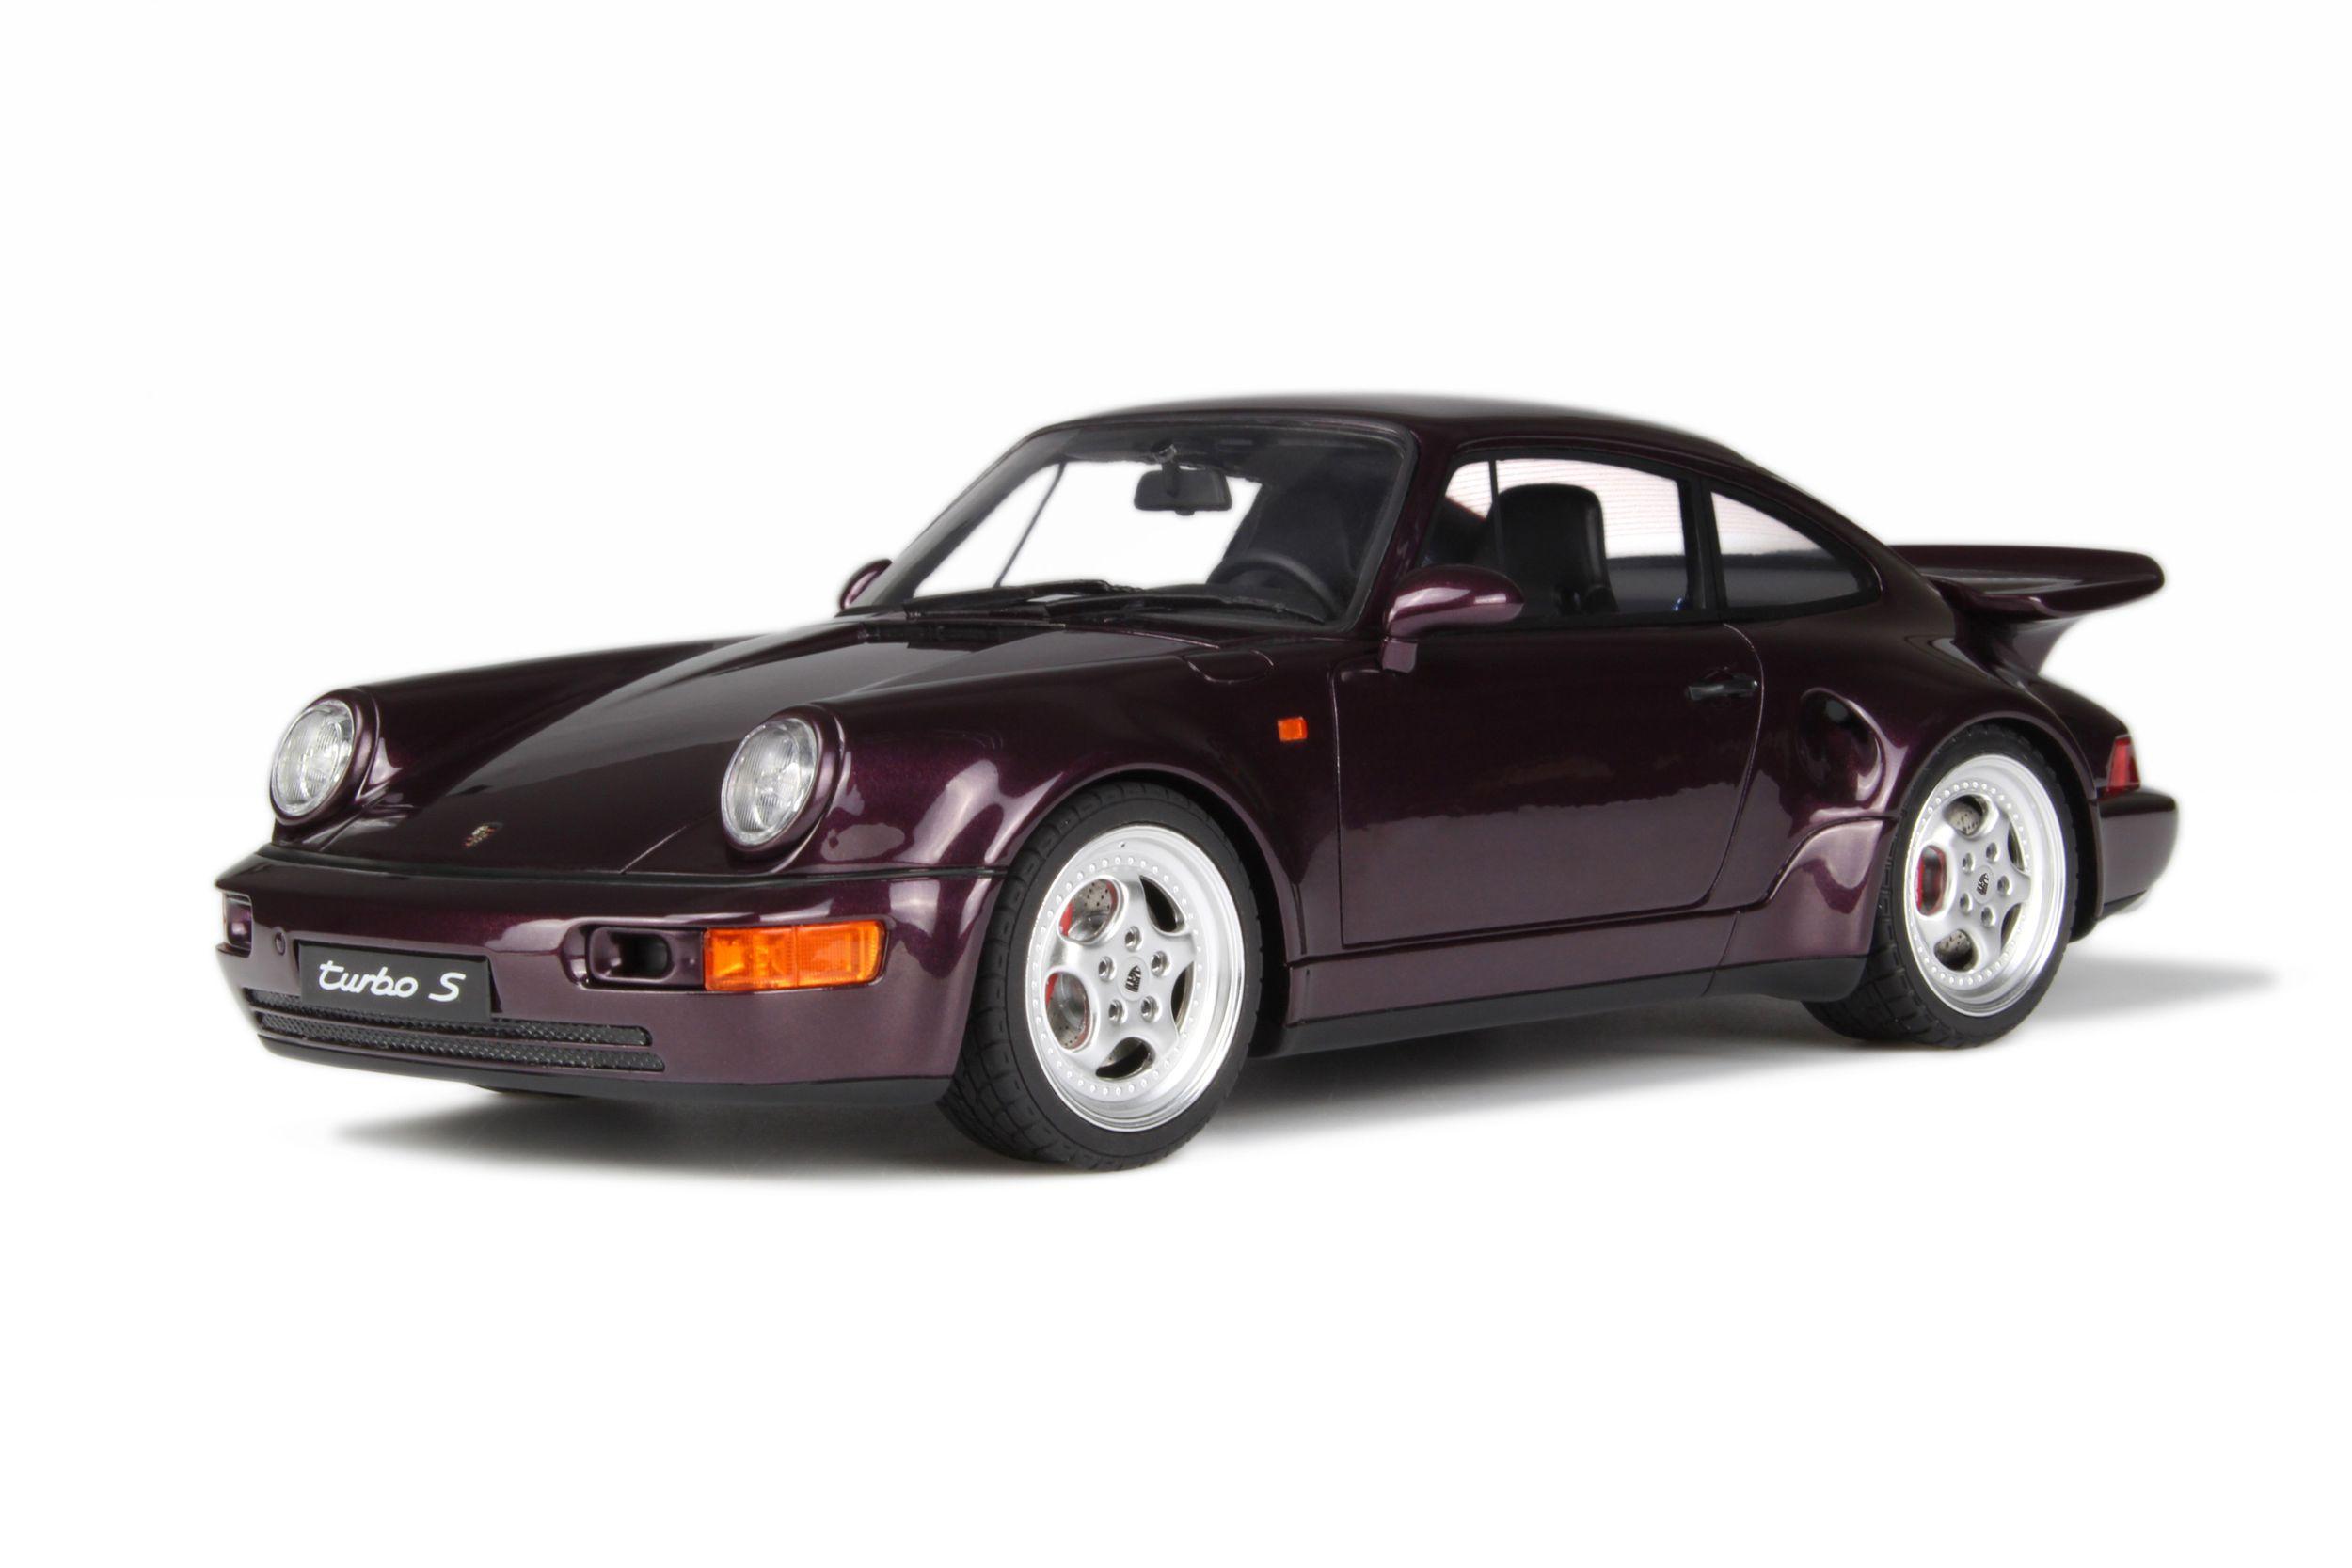 Porsche 911 (964) Turbo S Leichtbau